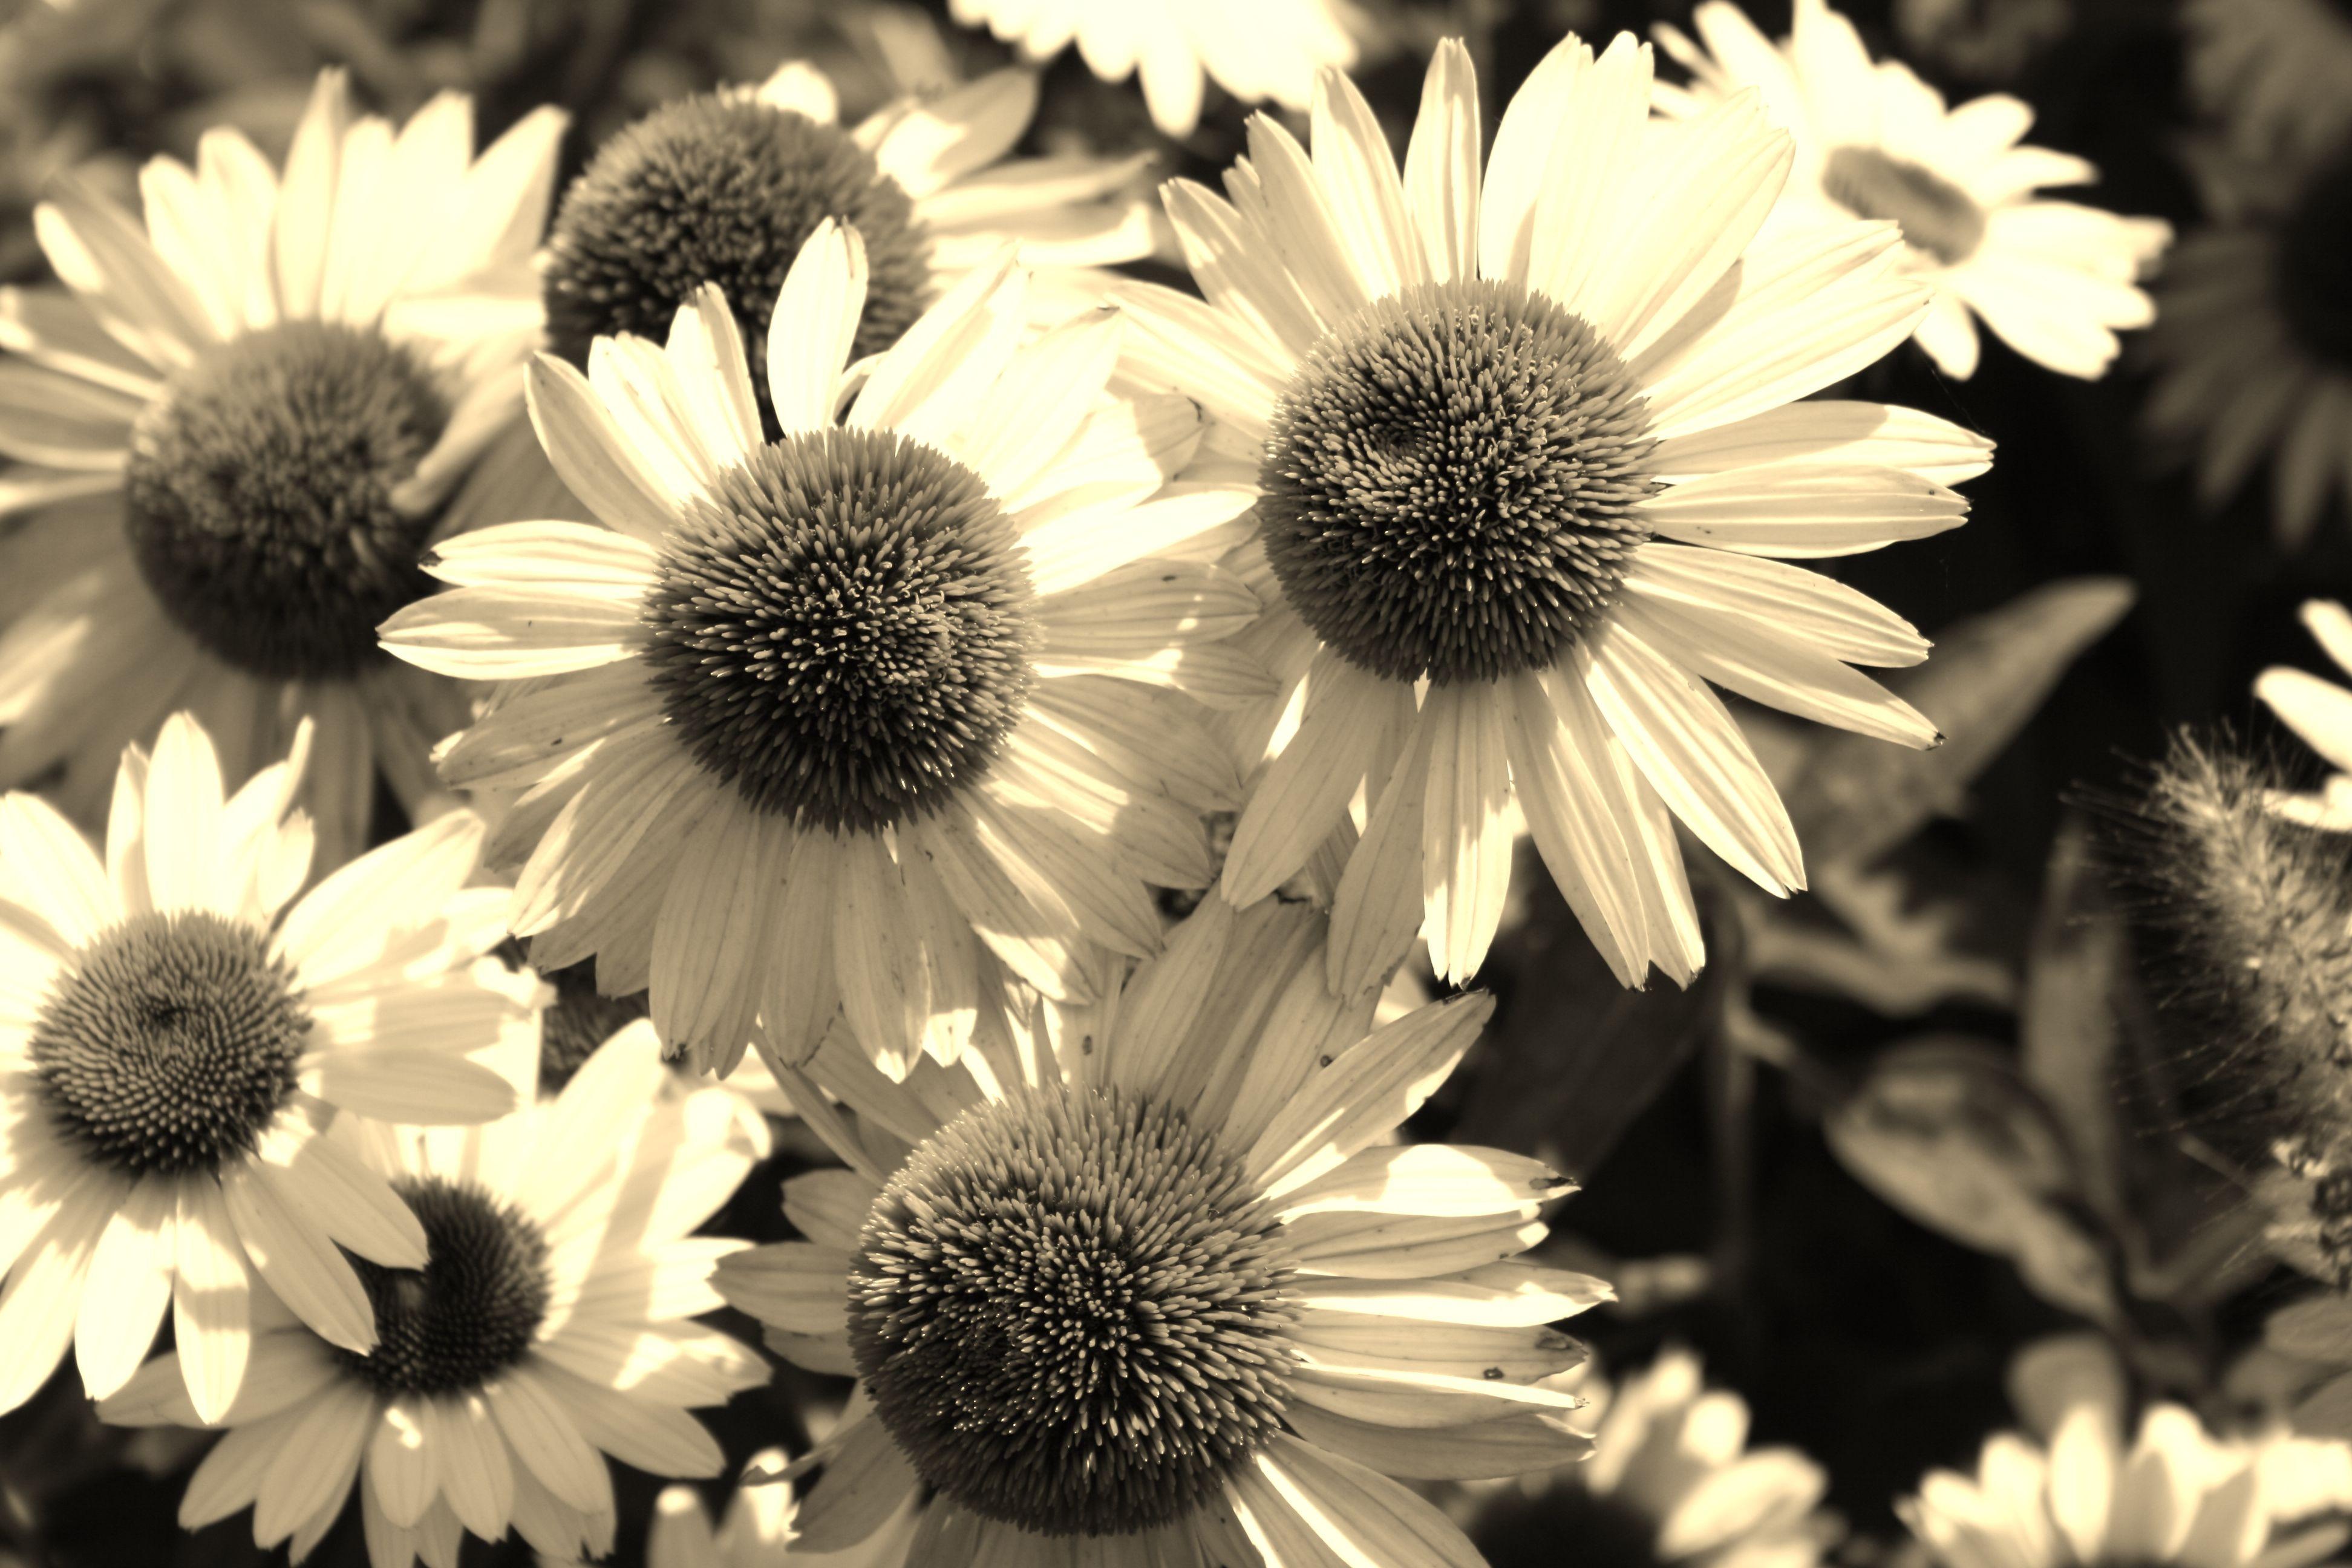 I love daisies! :)